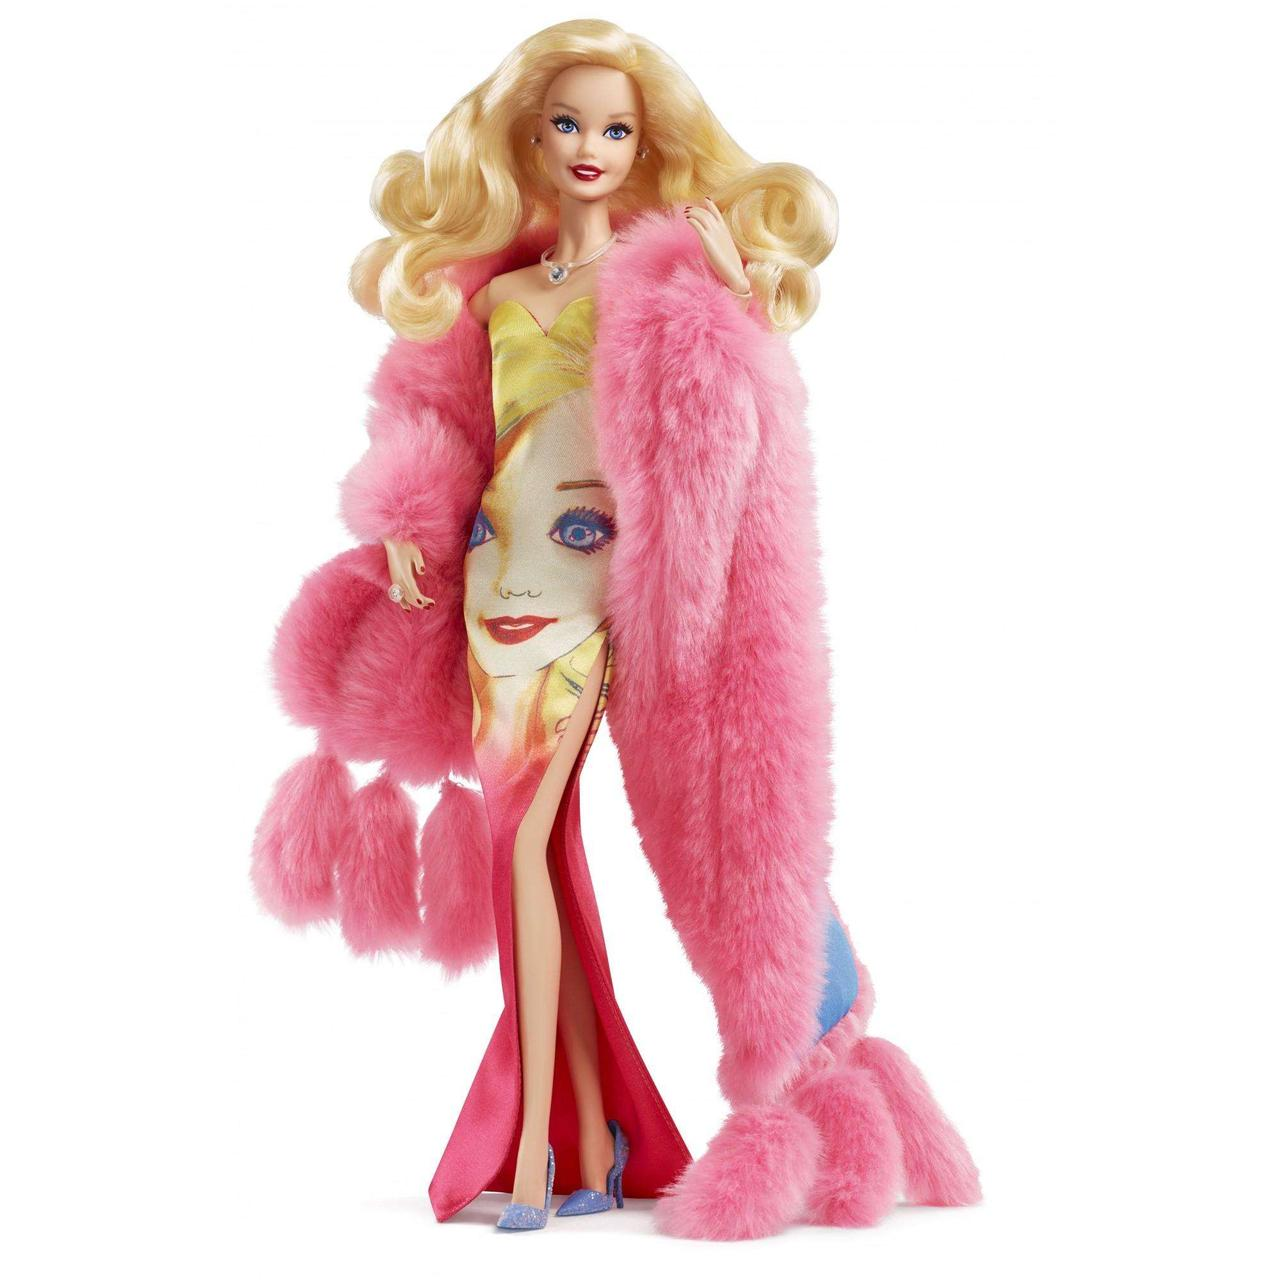 Barbie Колекційна лялька Барбі Енді Уорхол Коллекционная кукла Барби Энди Уорхол